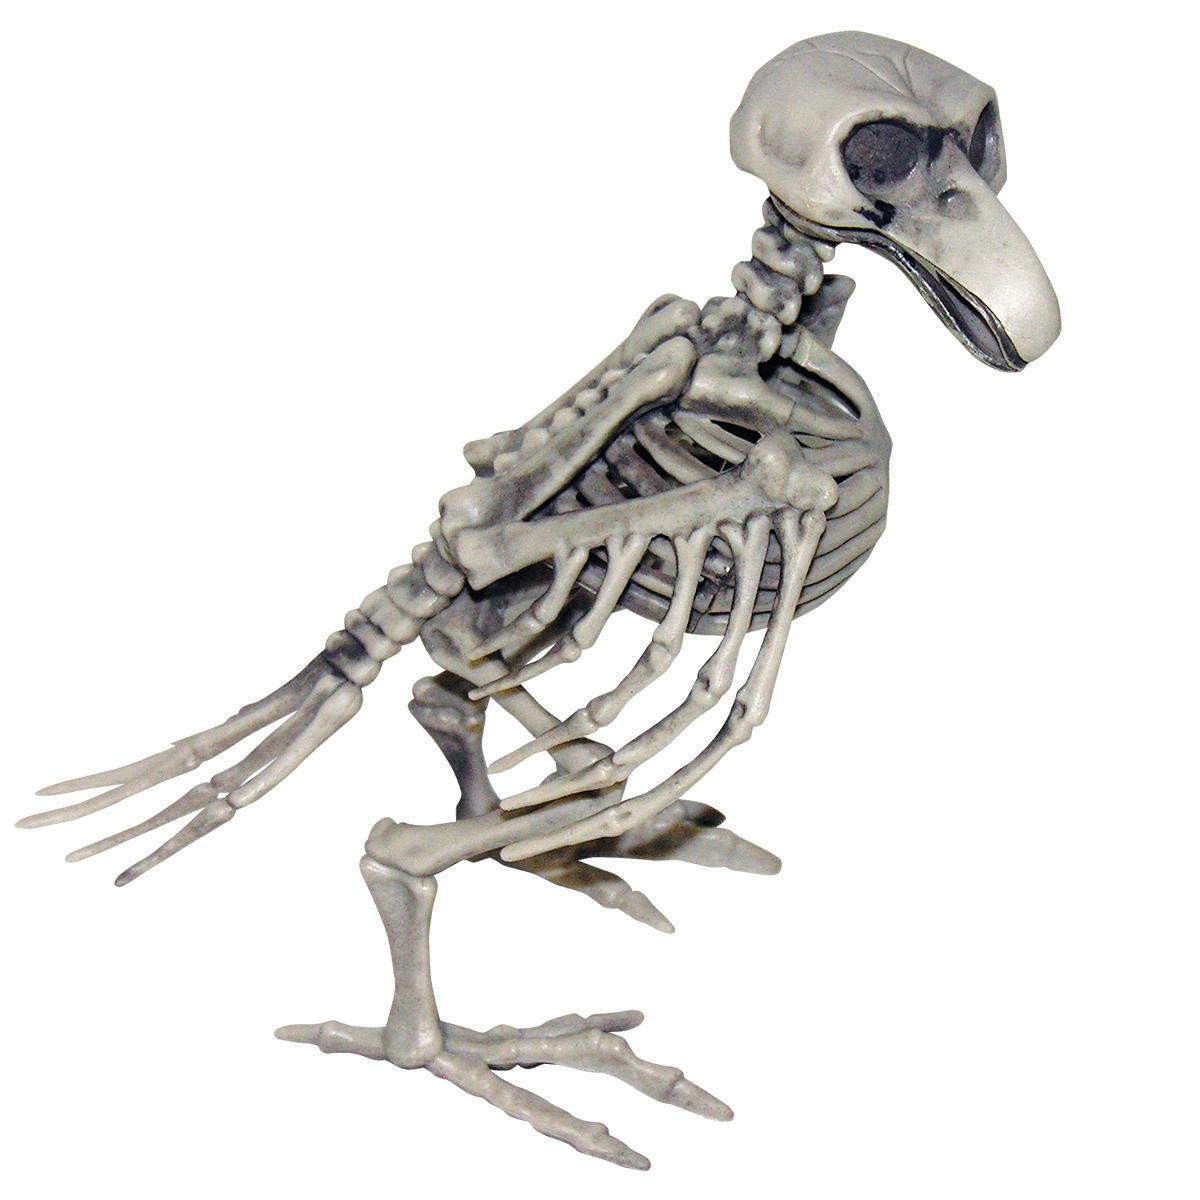 Fågelskelett dekoration